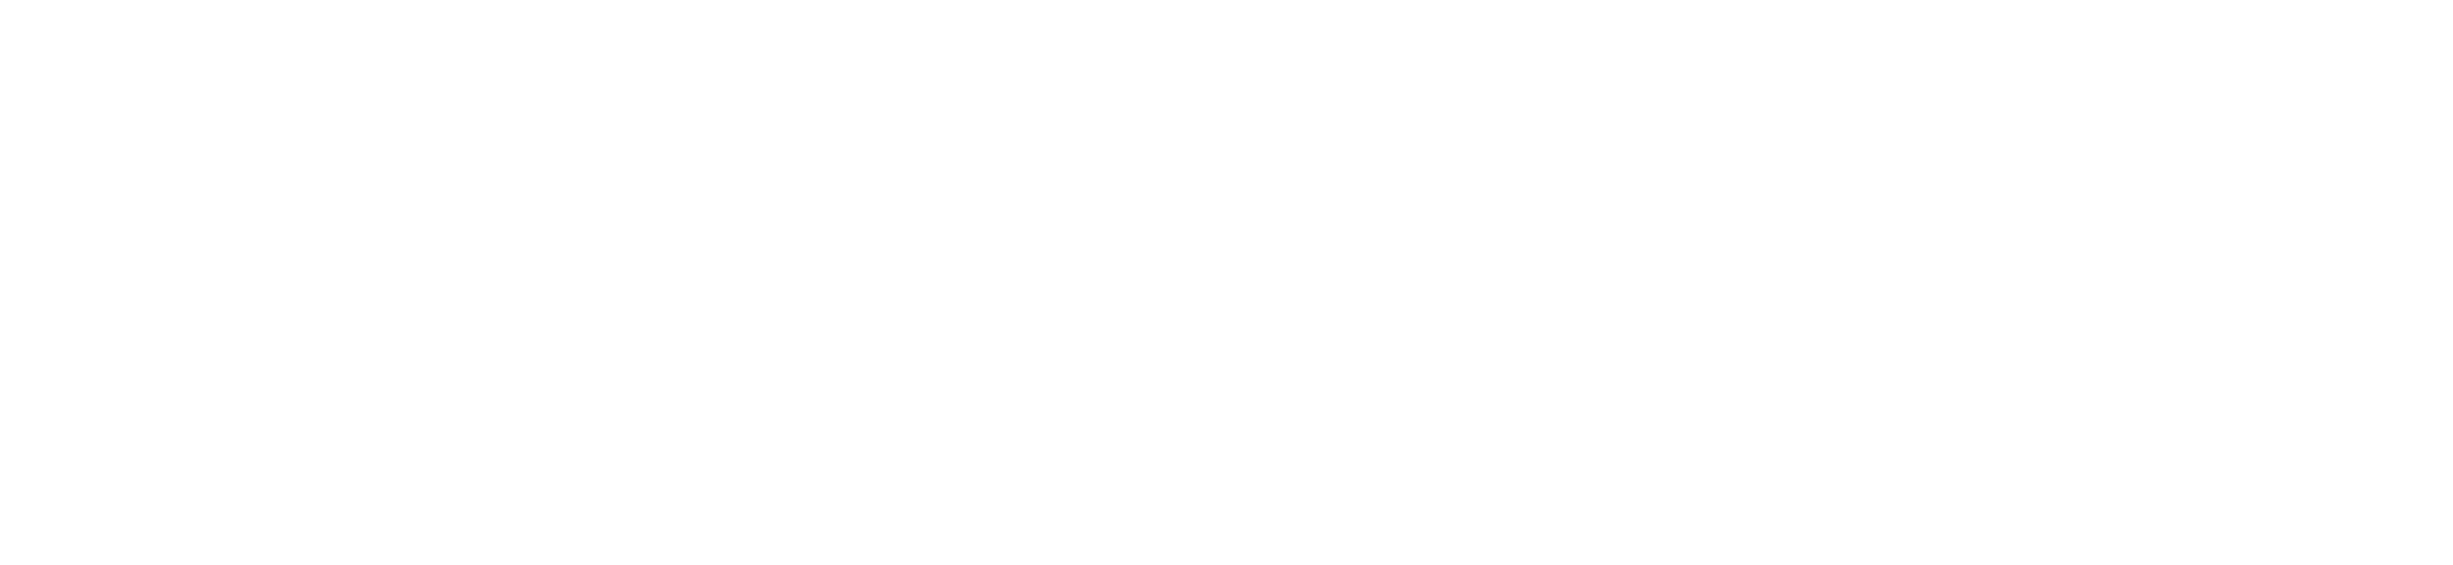 UMBC-wShield-1C-white.png